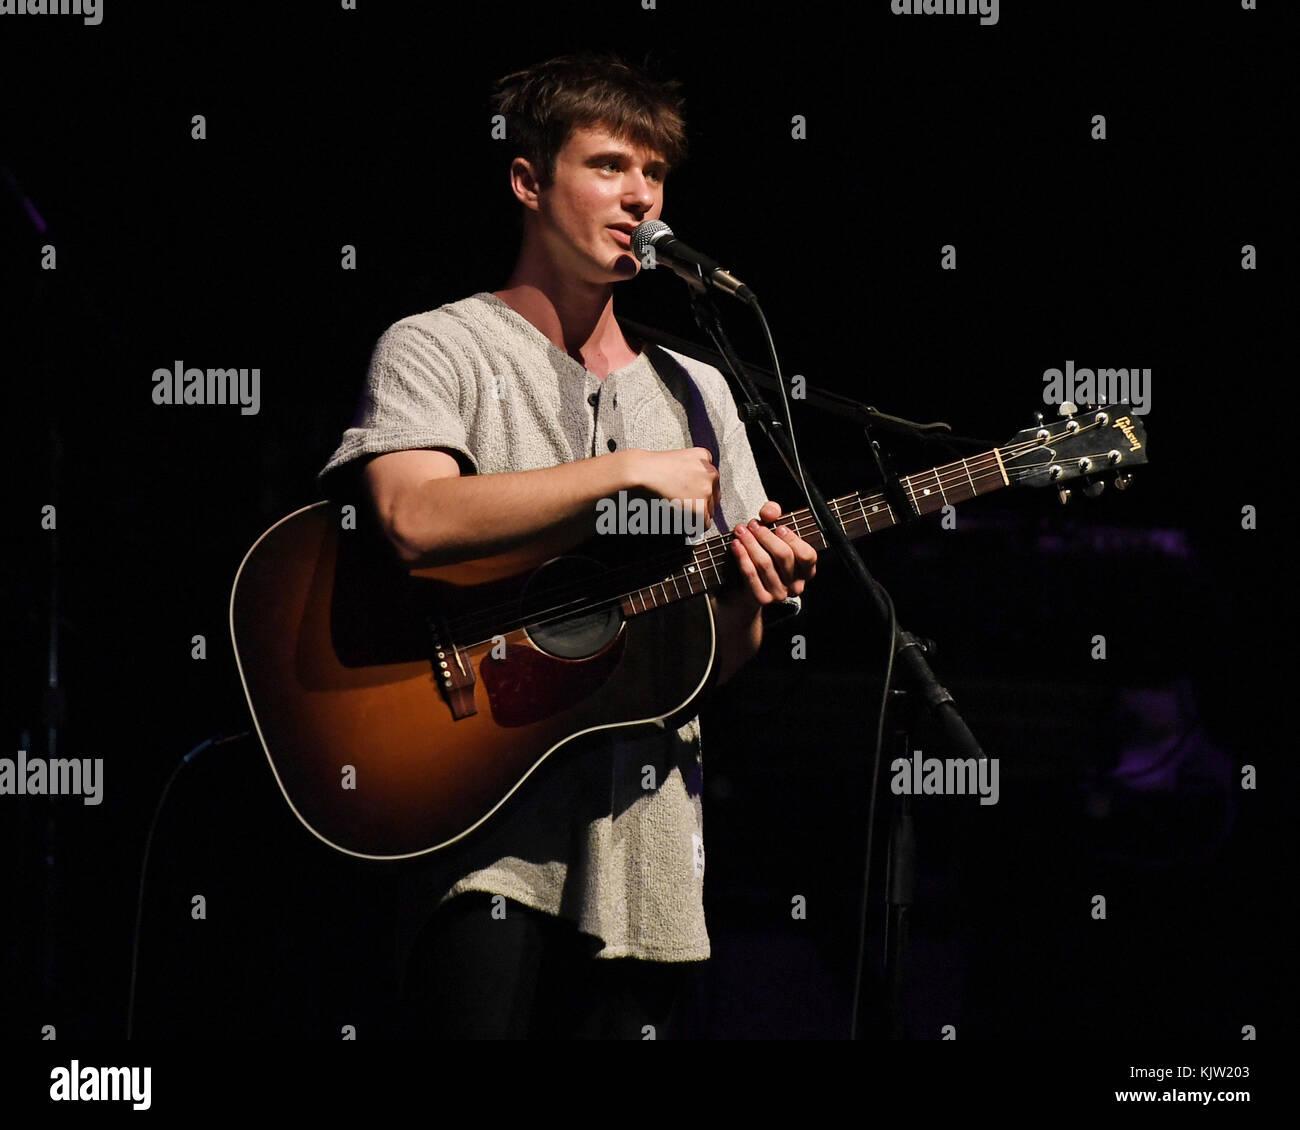 MIAMI BEACH, FL - DECEMBER 22: Alec Benjamin performs at the Fillmore on December 22, 2016 in Miami Beach, Florida. Stock Photo